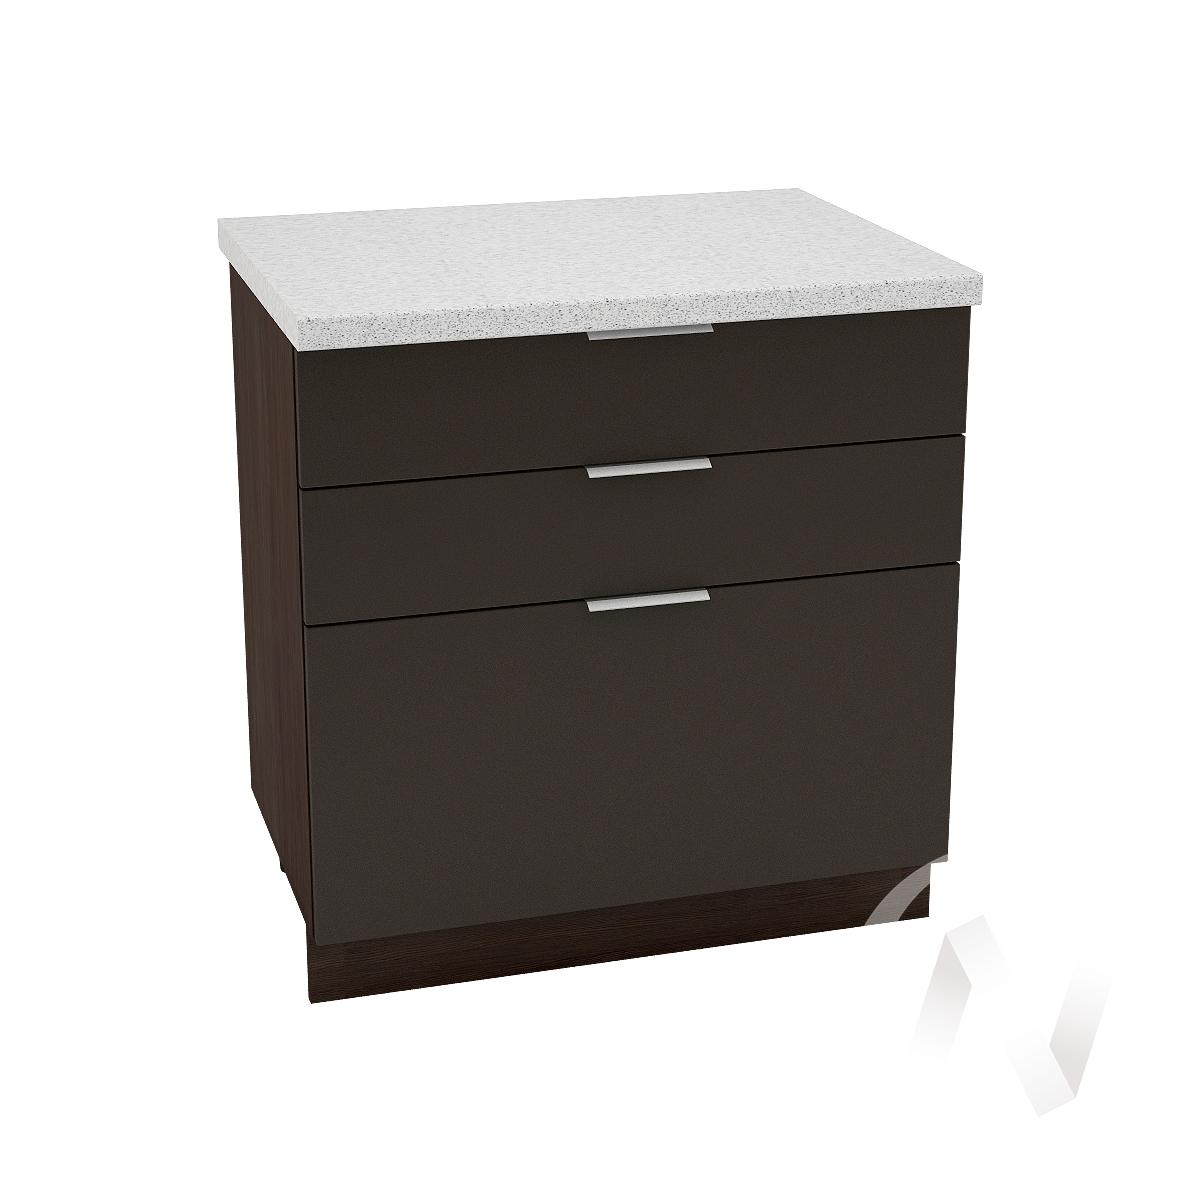 "Кухня ""Терра"": Шкаф нижний с 3-мя ящиками 800, ШН3Я 800 (смоки софт/корпус венге)"